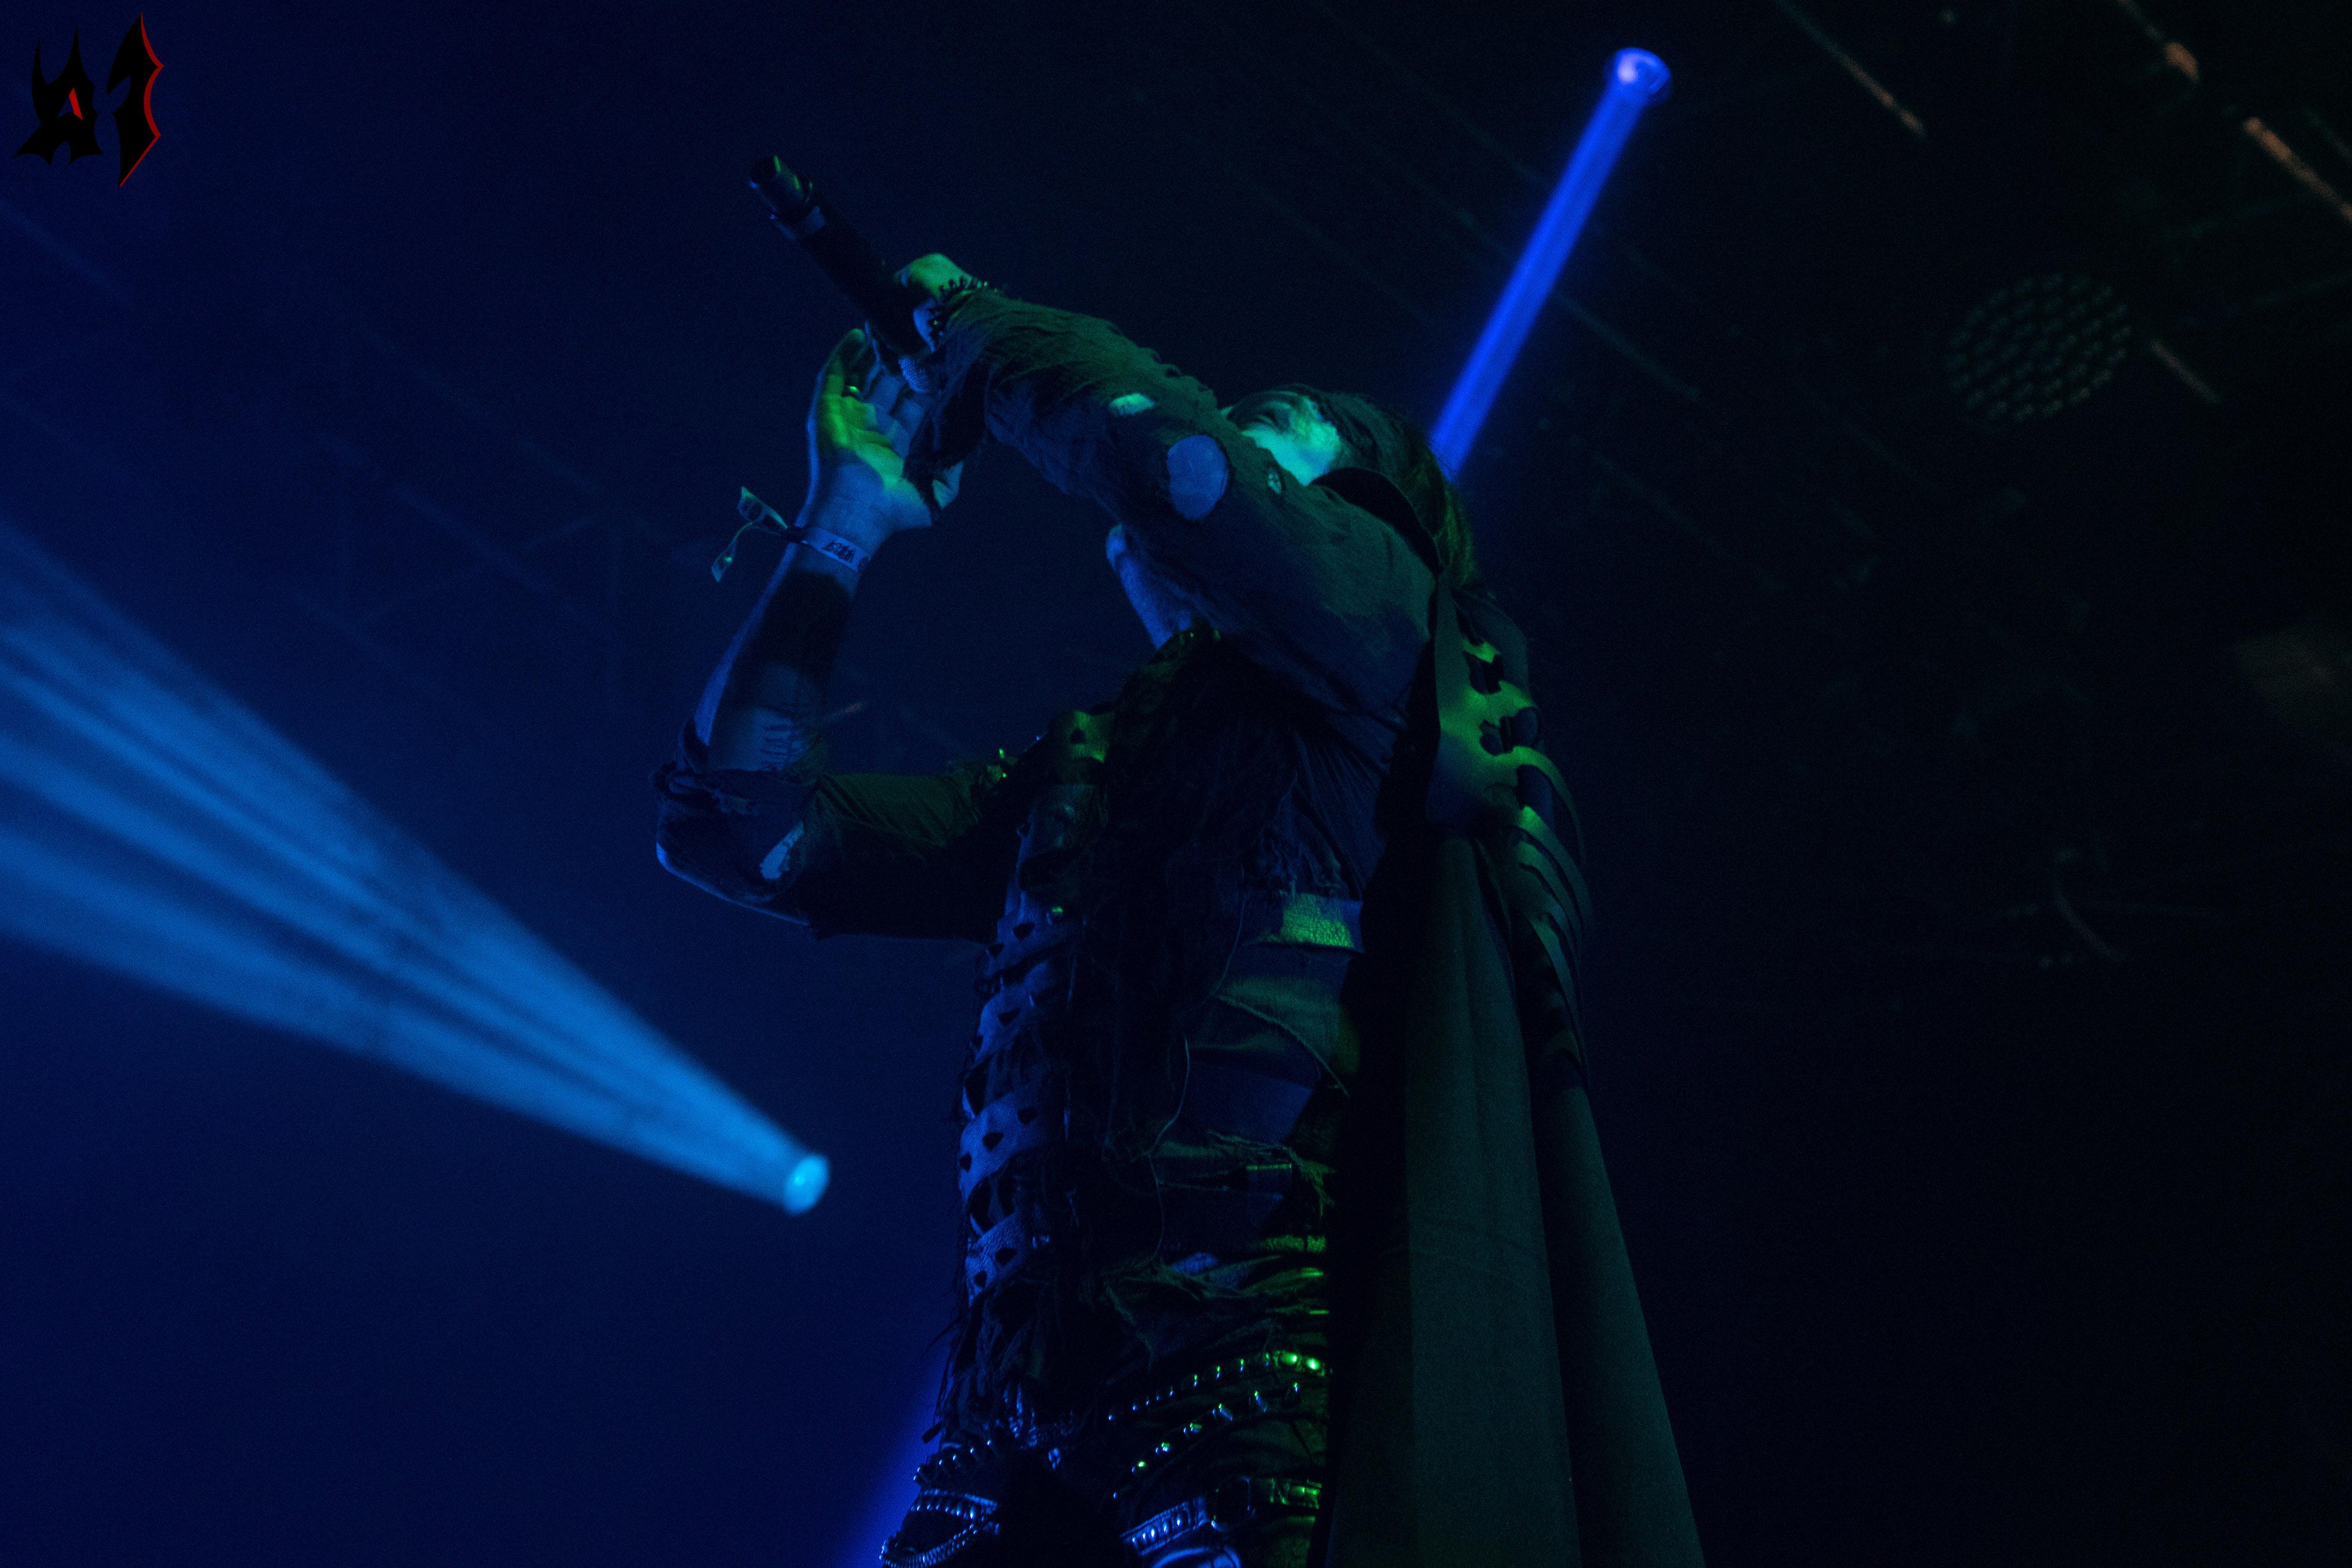 Hellfest - Cradle Of Filth - 22